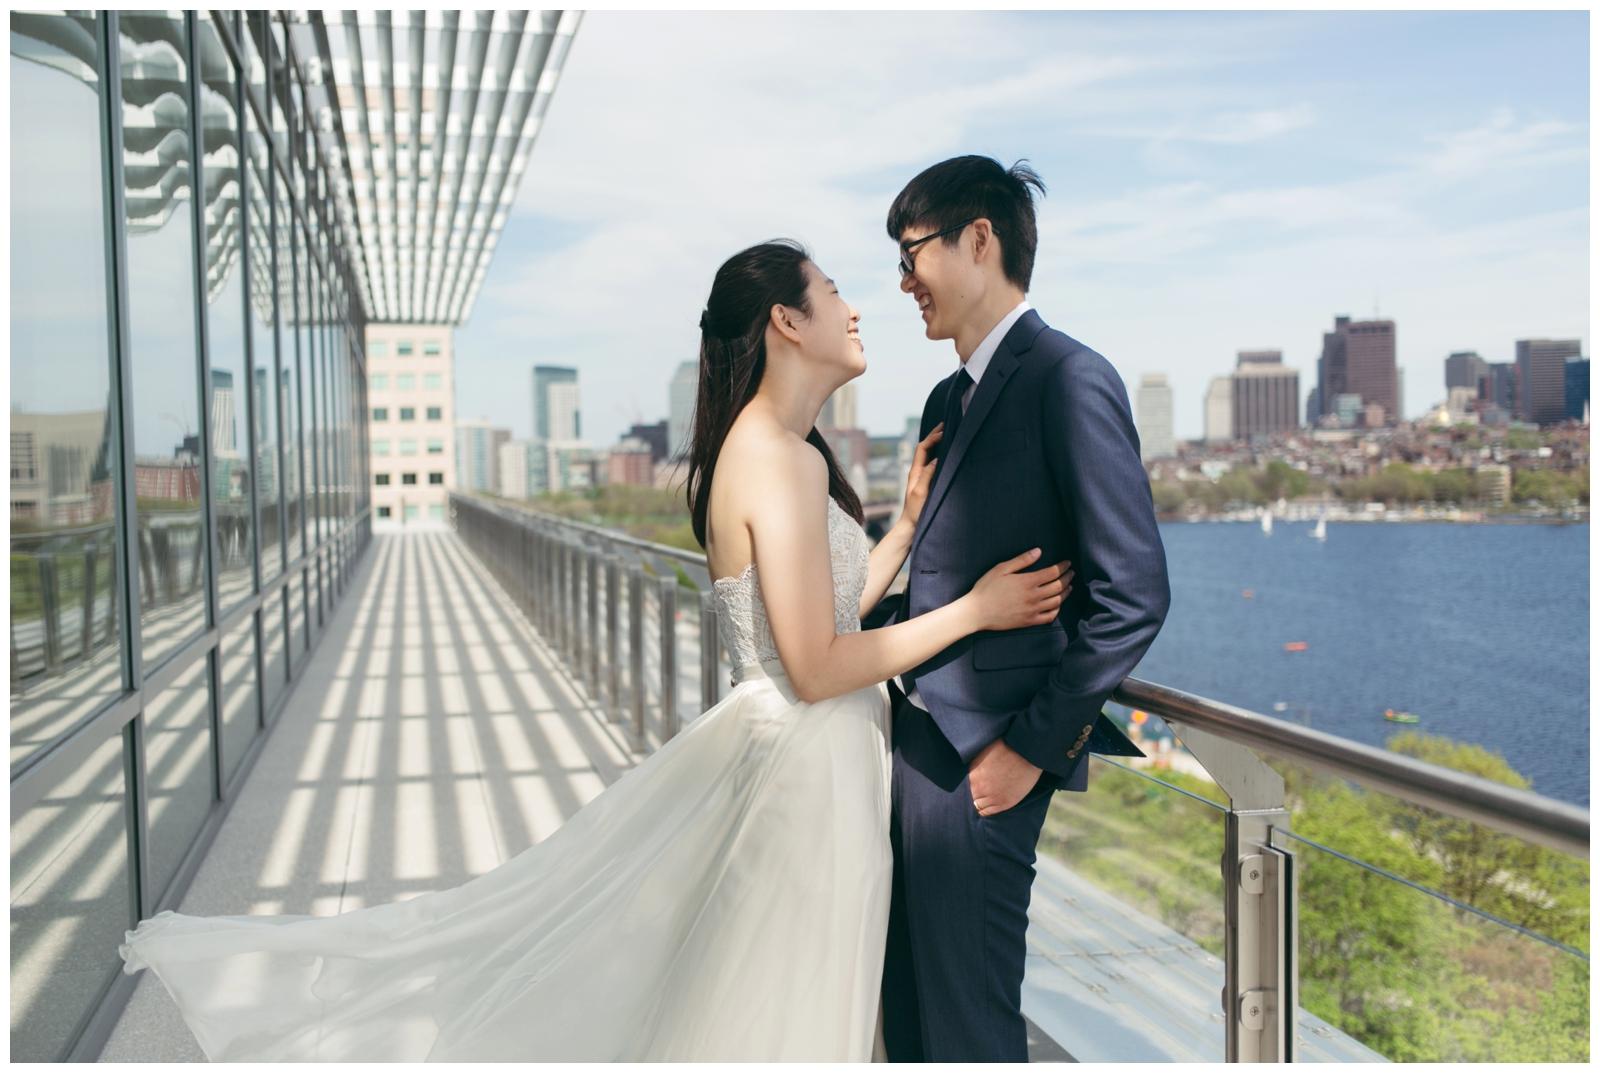 Samberg-Conference-Center-Boston-Wedding-Photographer-Bailey-Q-Photo-140.jpg